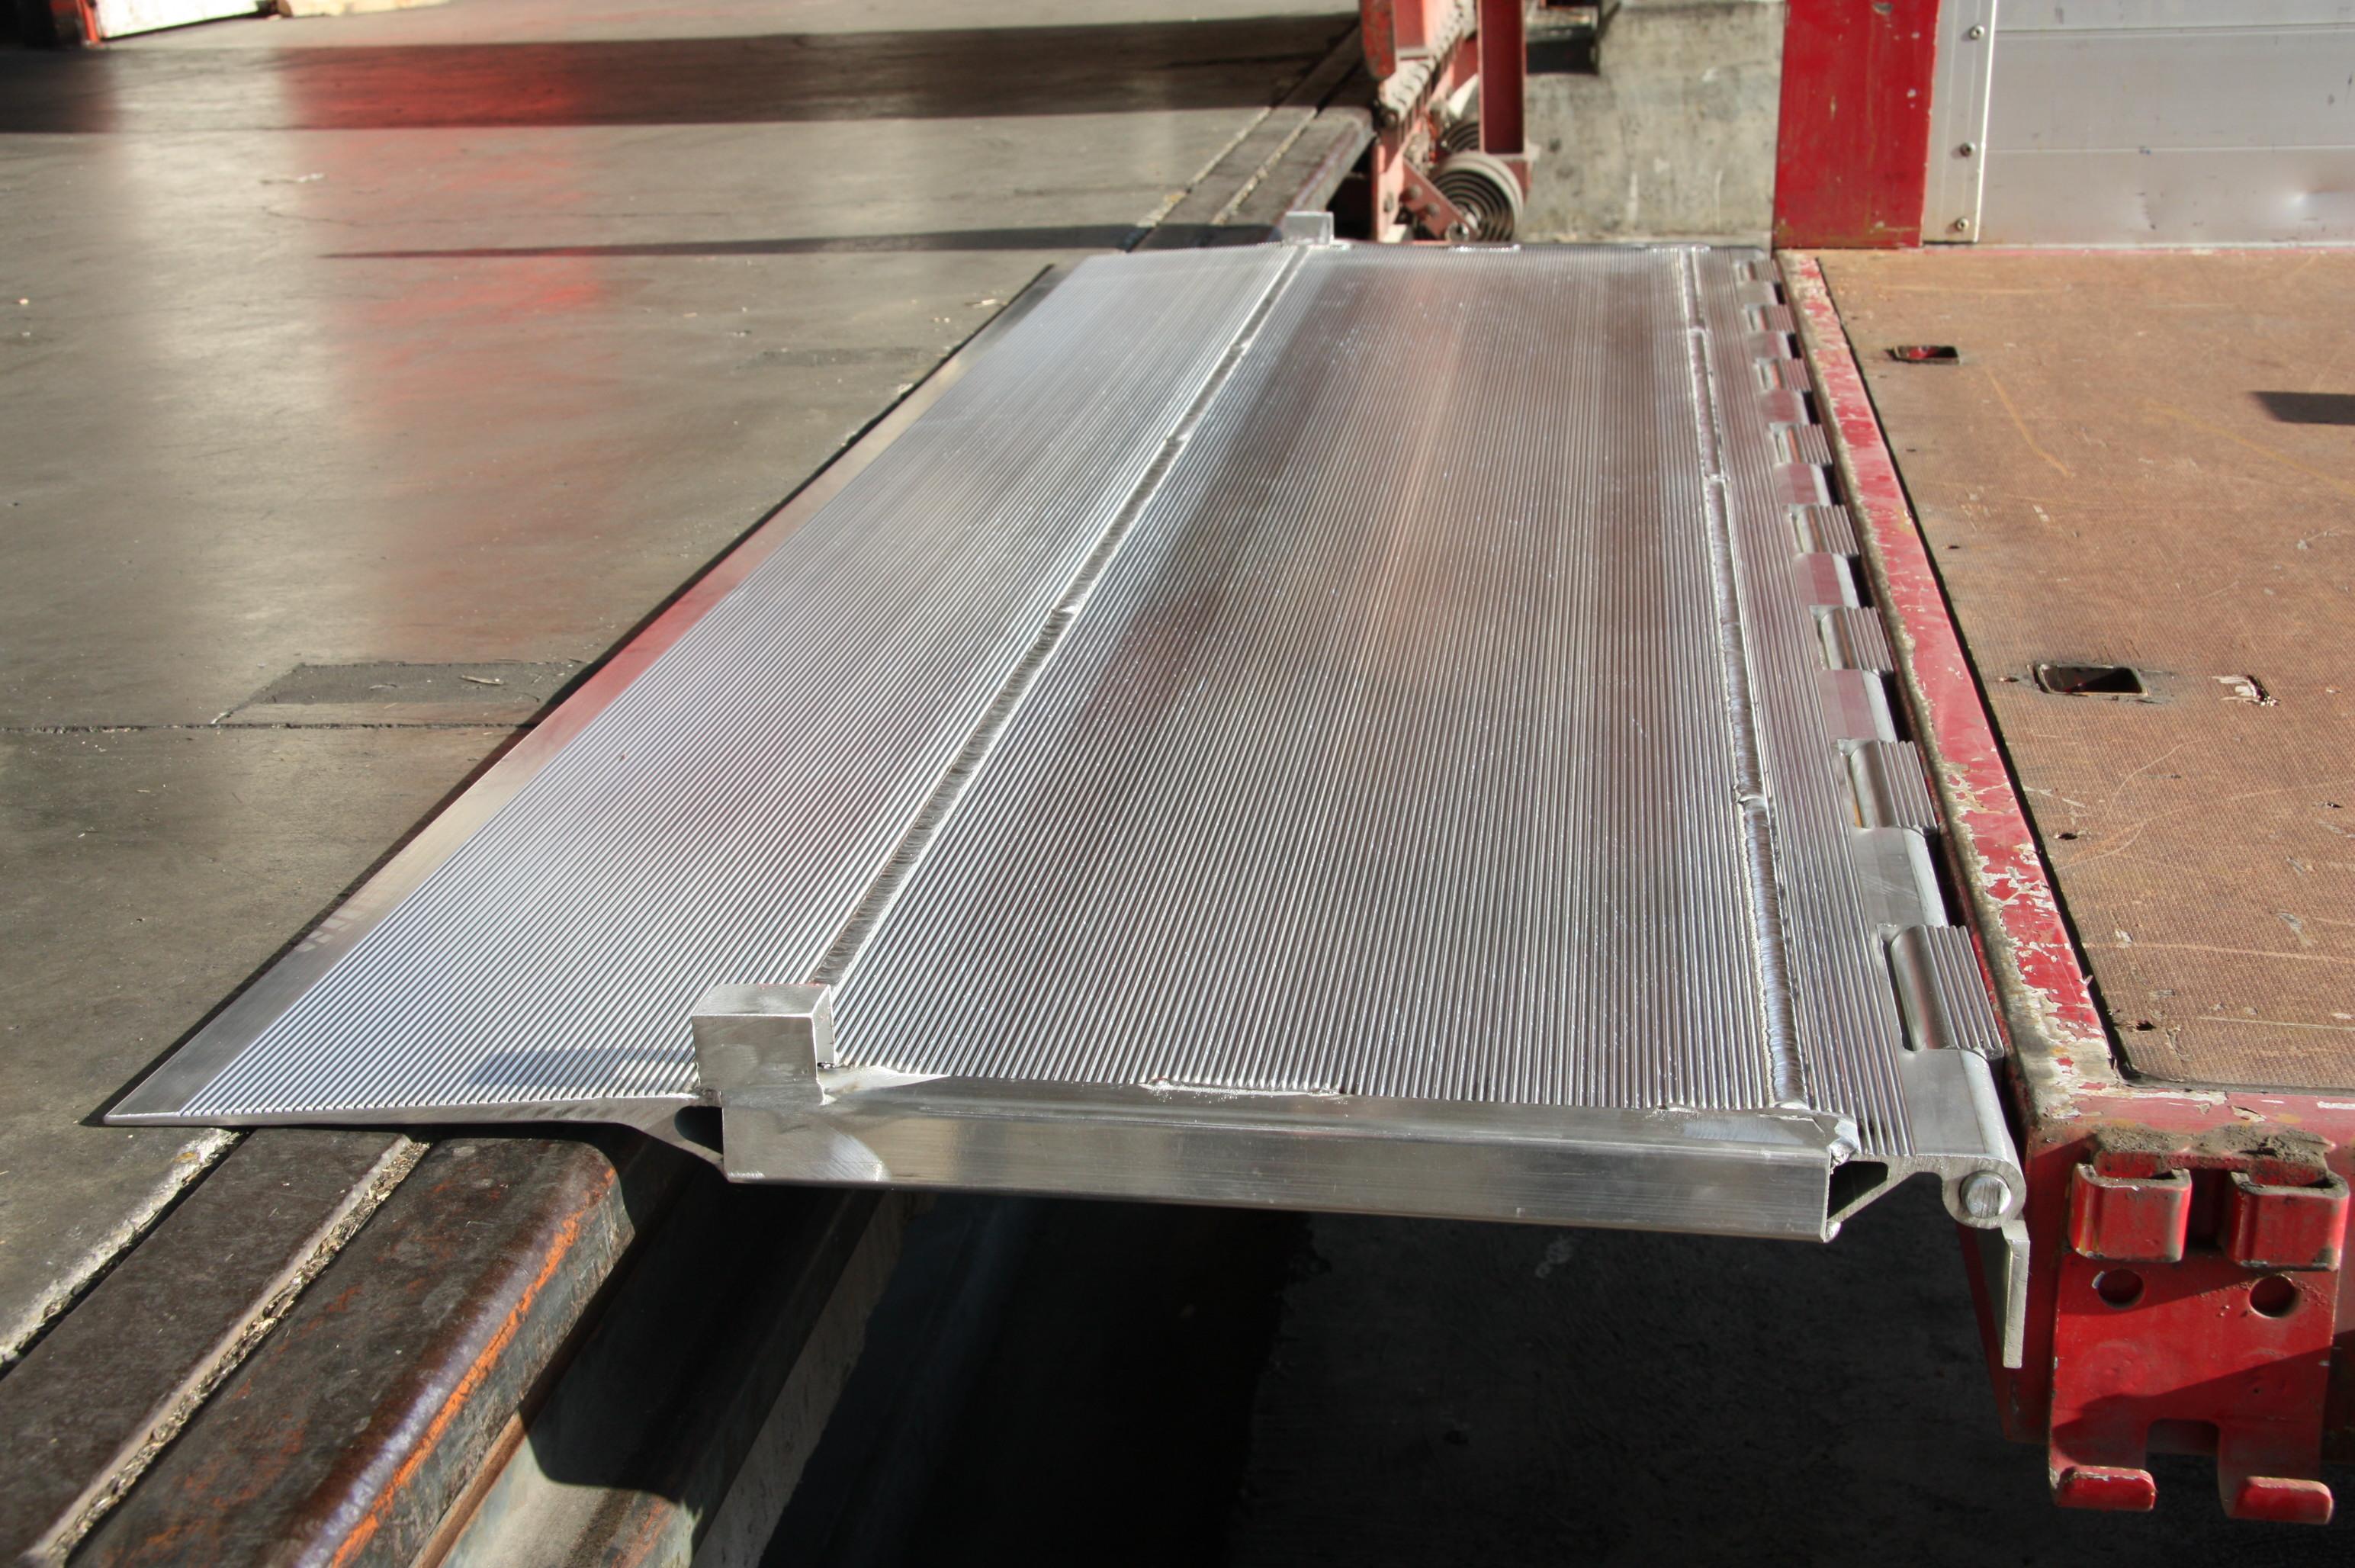 Hinged Tailboards or Bridge Plates